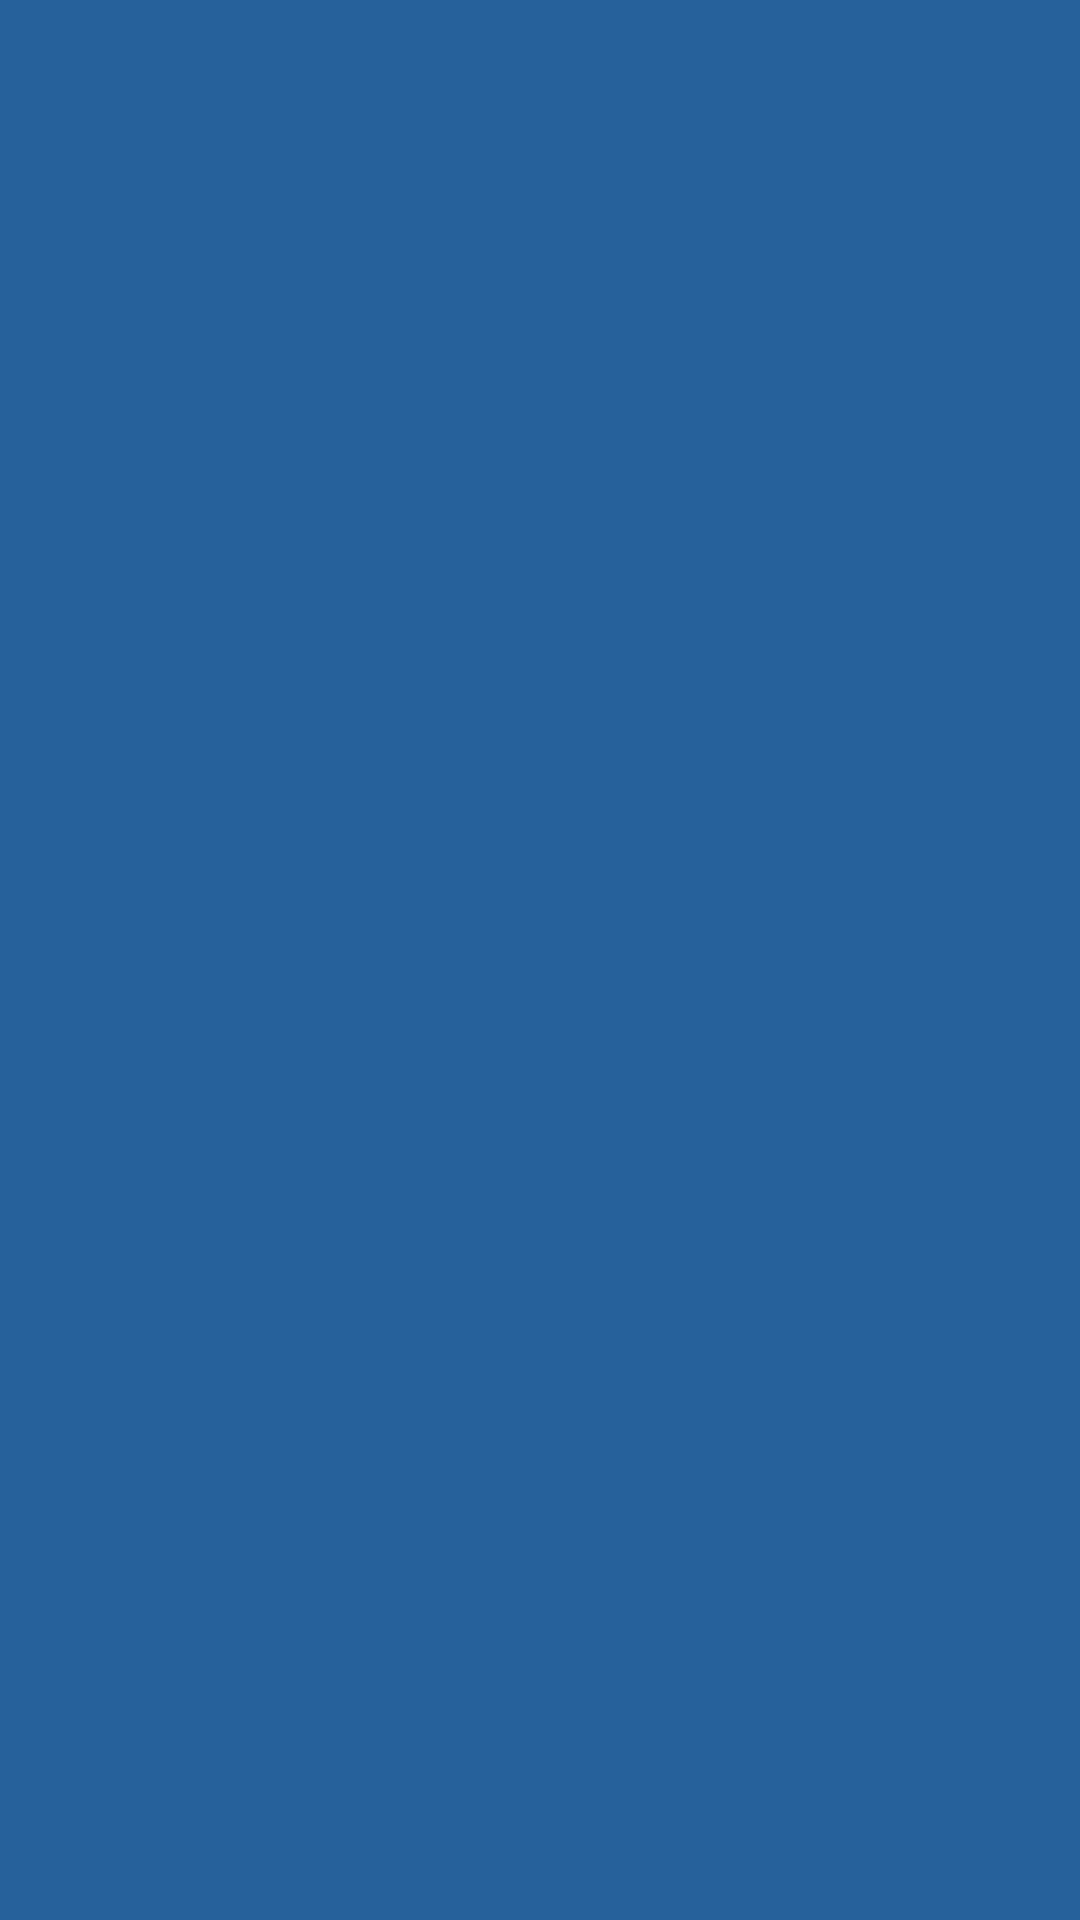 1080x1920 Lapis Lazuli Solid Color Background